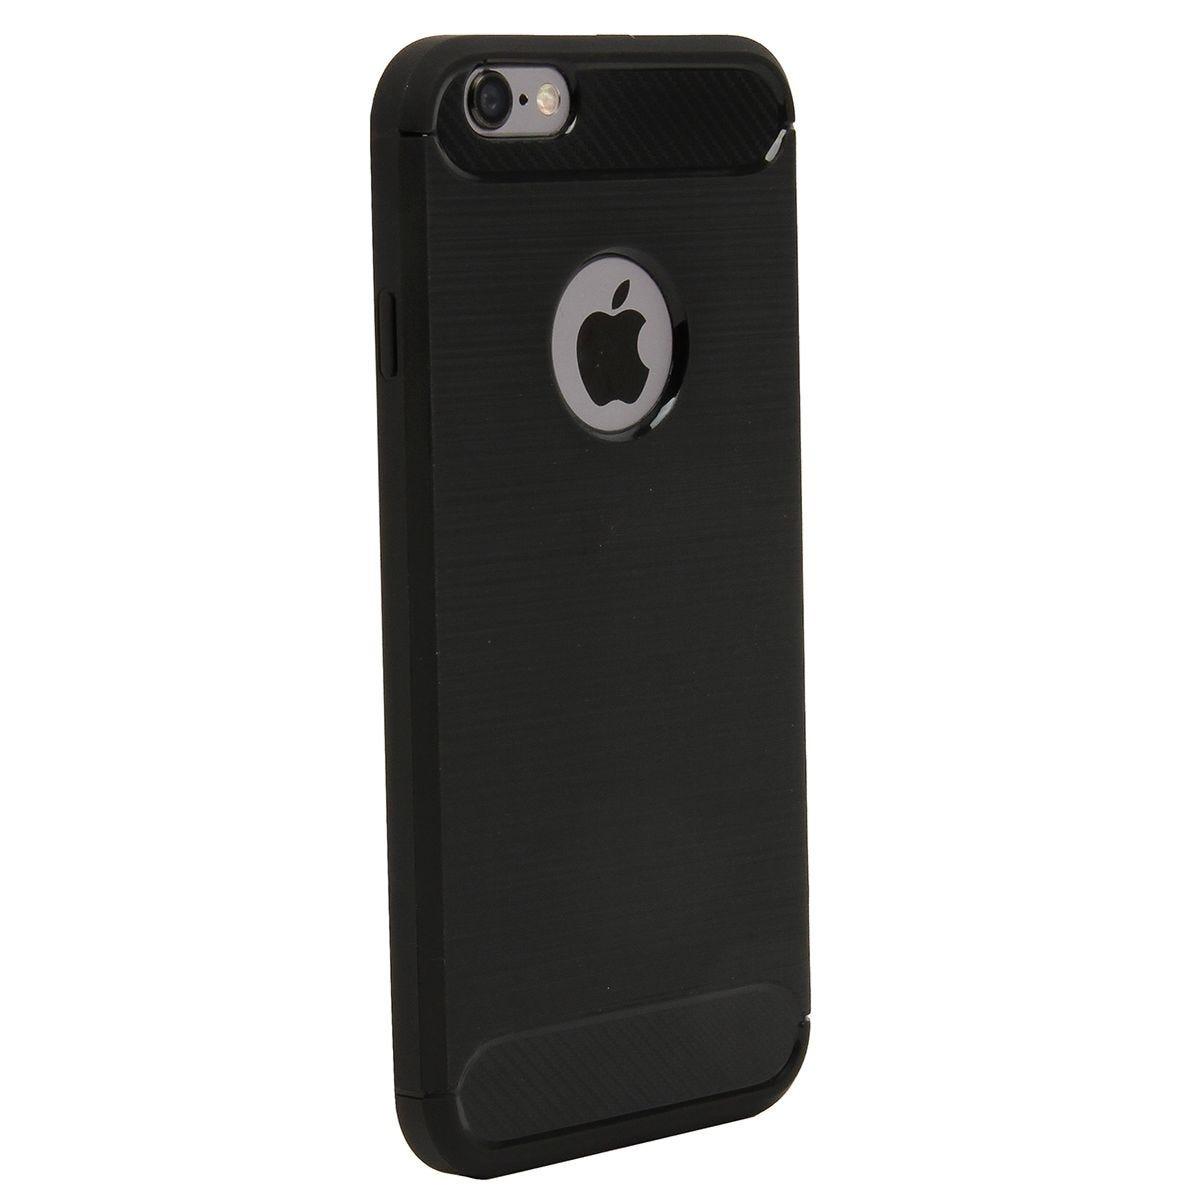 Case Brushed Carbon Black for iPhone 6